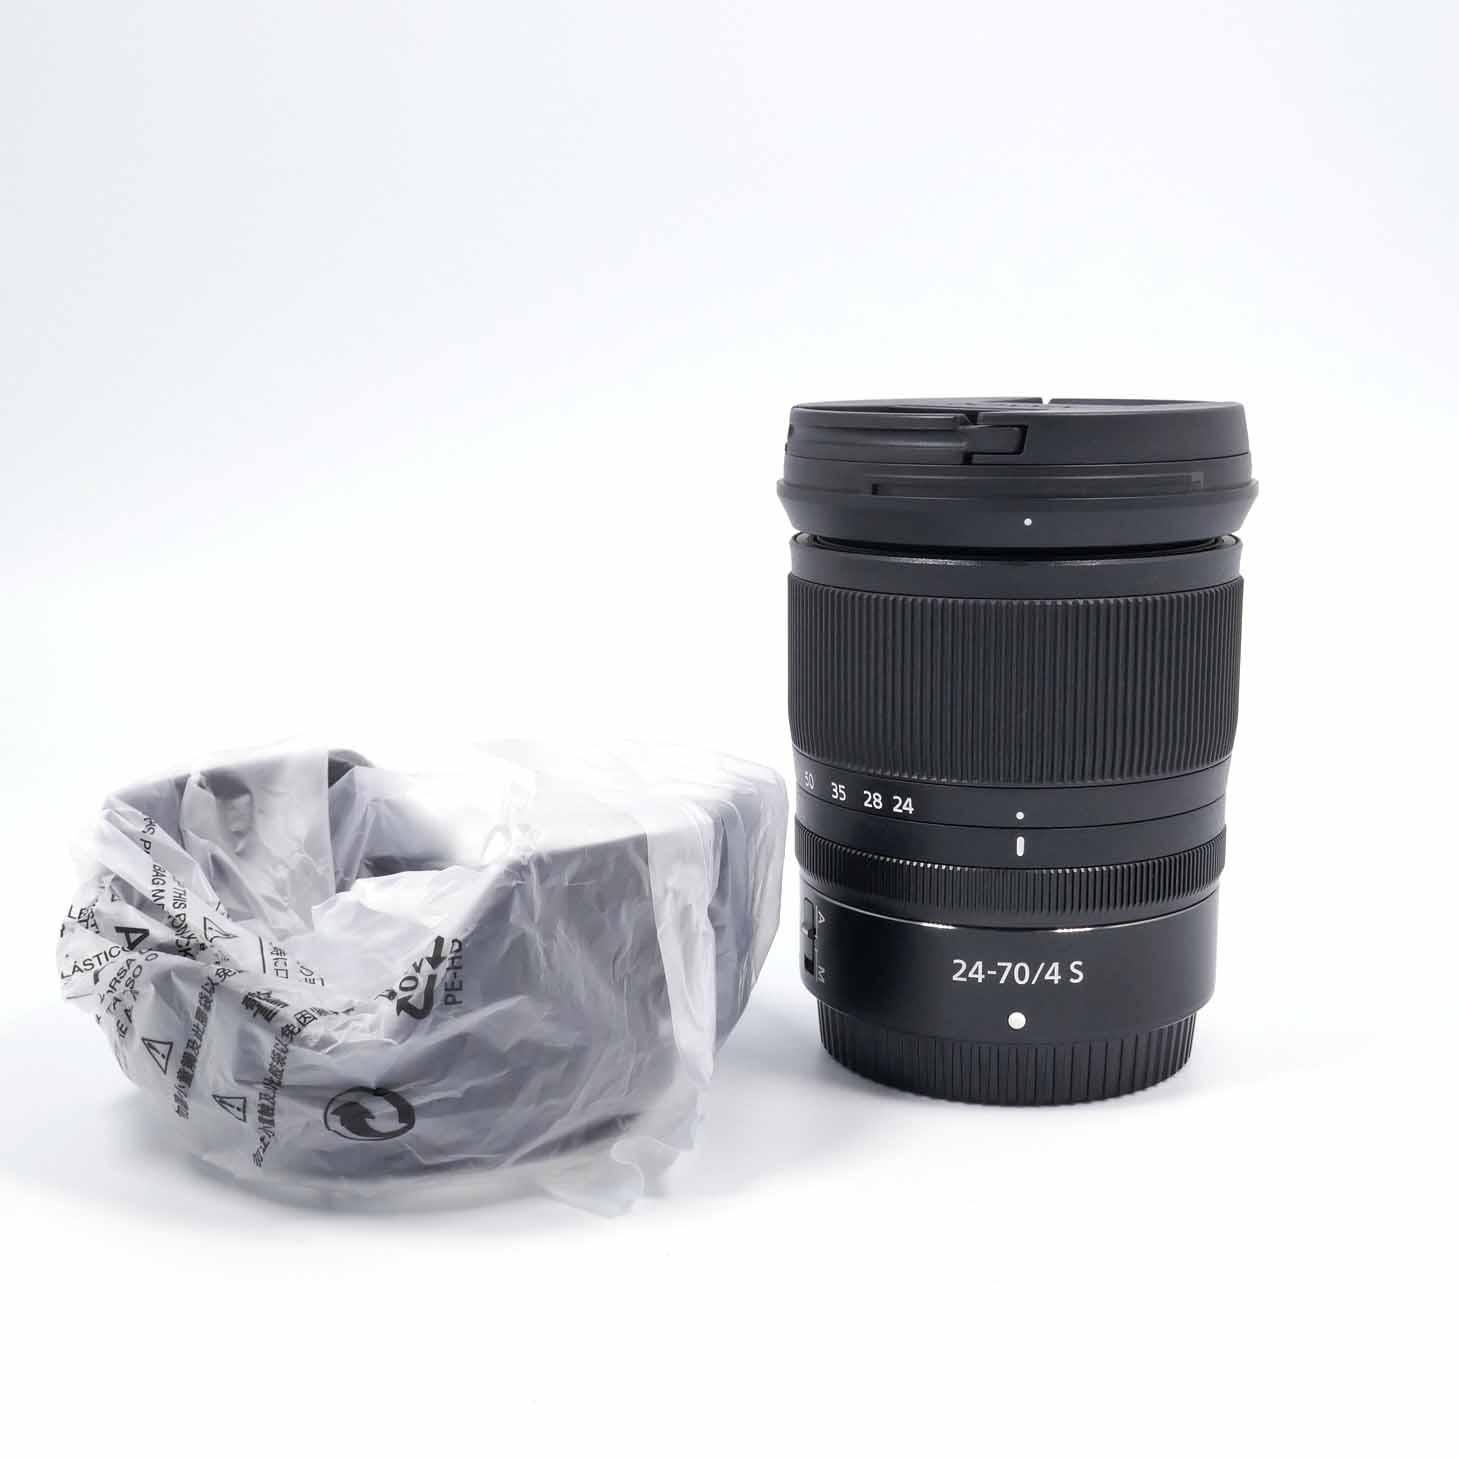 clean-cameras-Nikon-Z6-Kit-24-70-FTZ-05